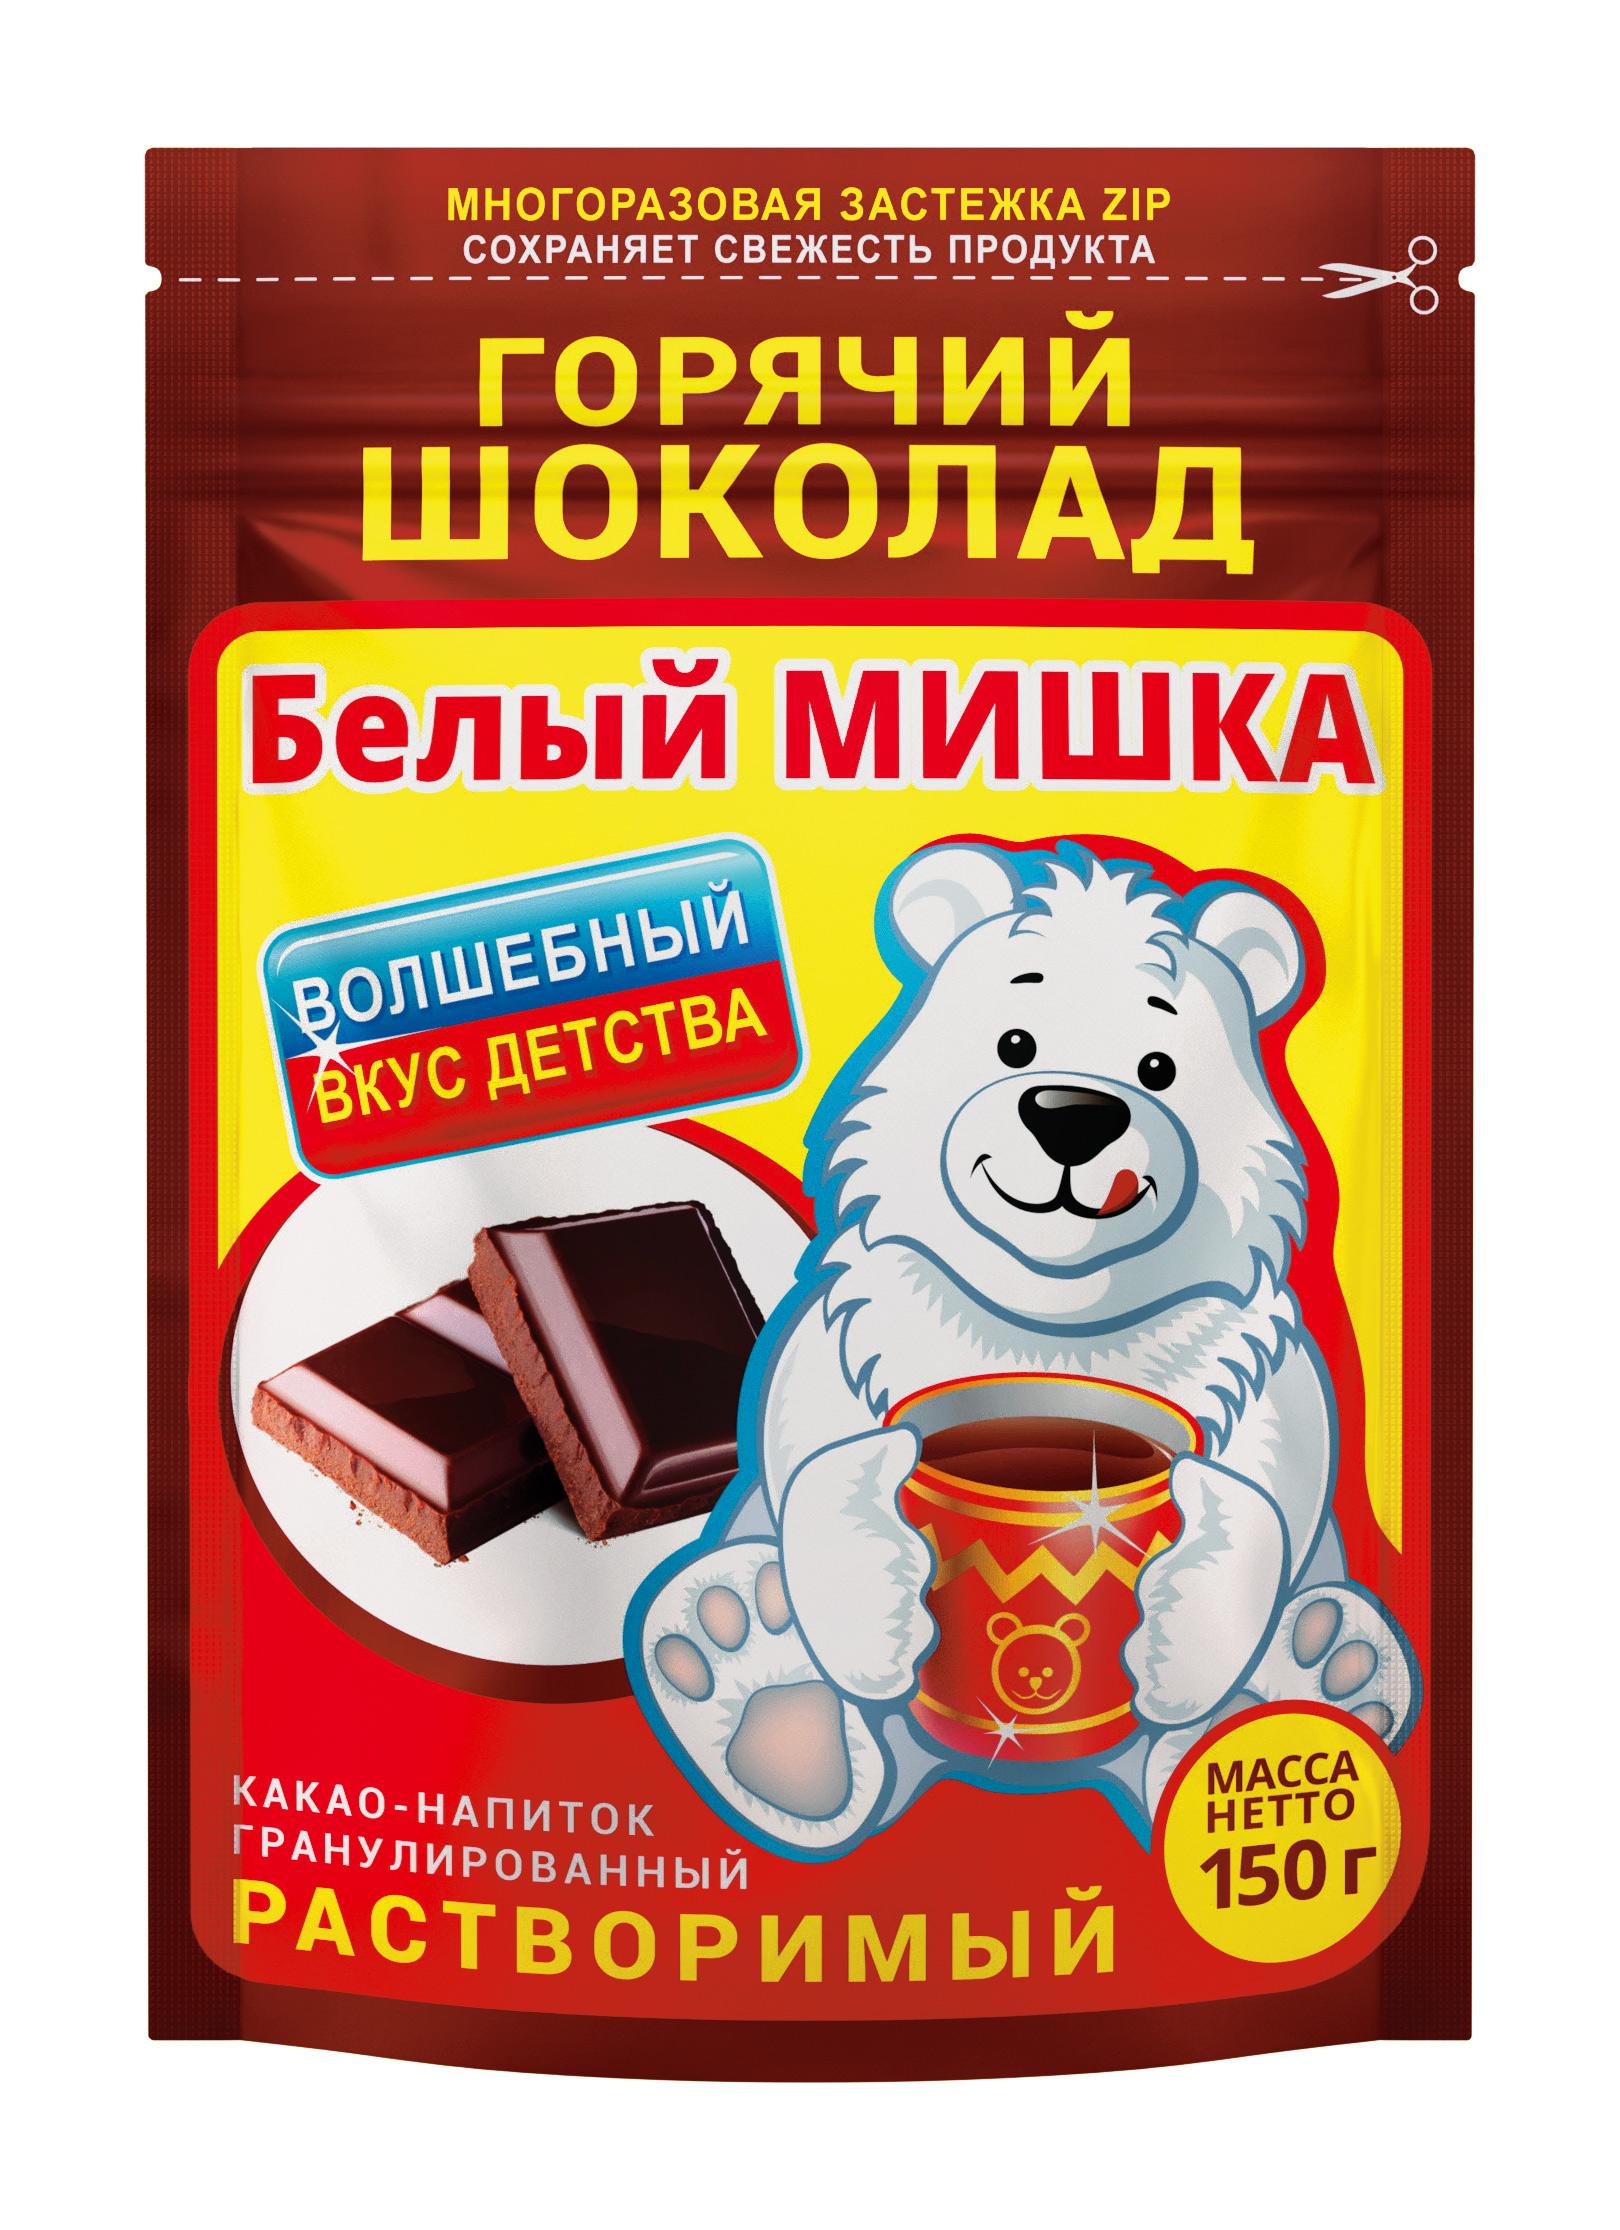 Картинка Какао-напиток гранула БЕЛЫЙ МИШКА горячий шоколад